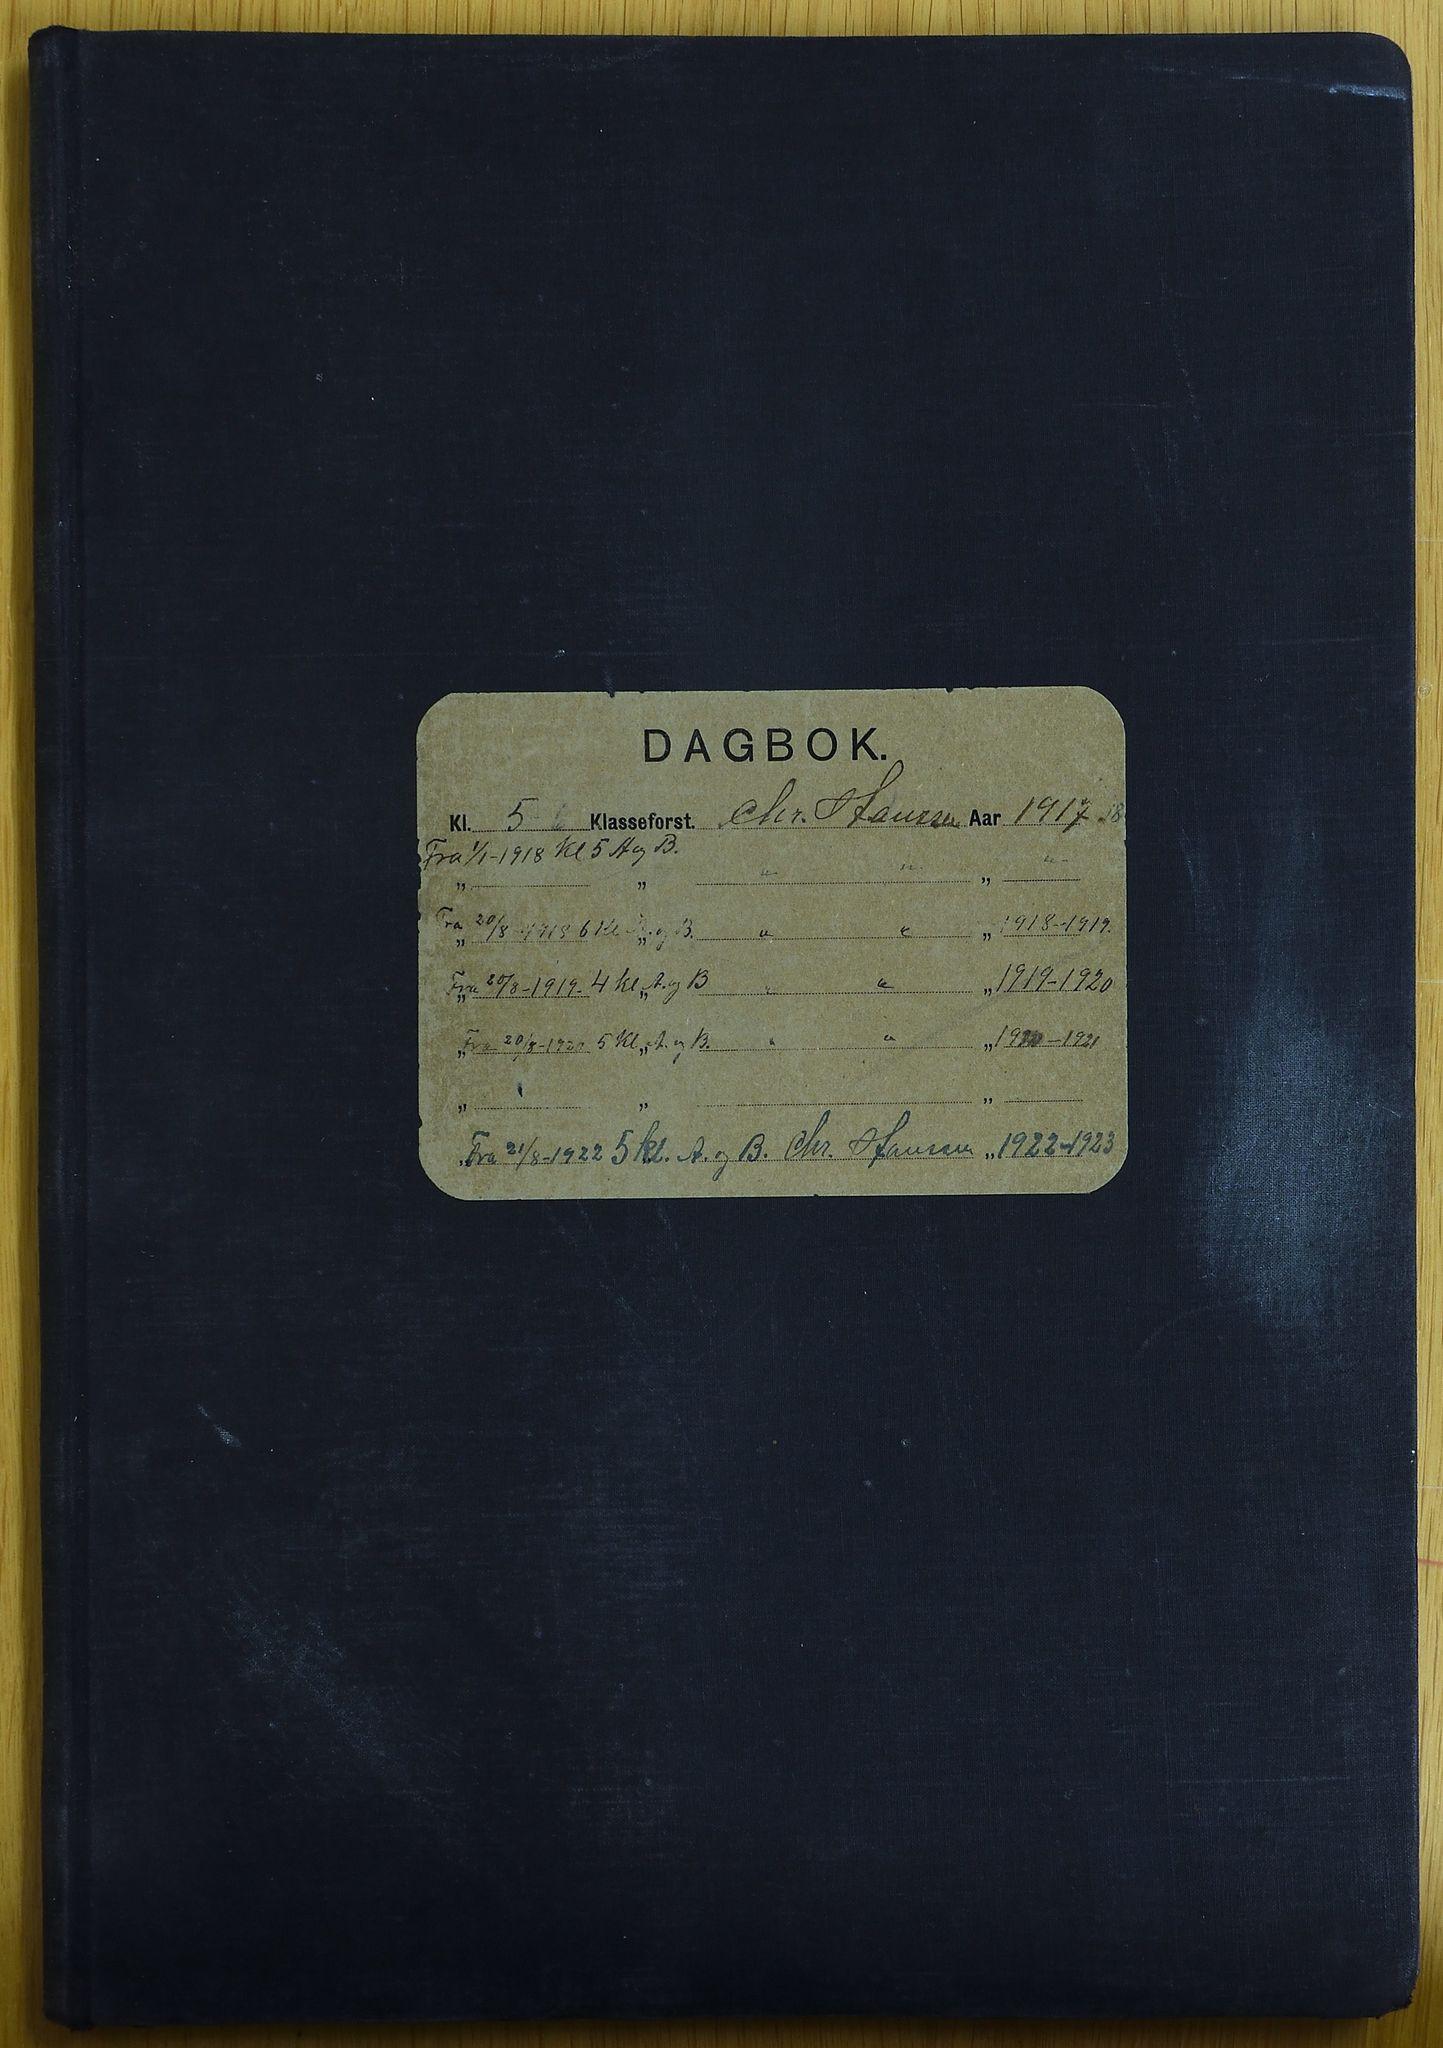 KVT, Vestre Toten municipality archive: School protocol, Raufoss School 1917-1924, 1917-1924